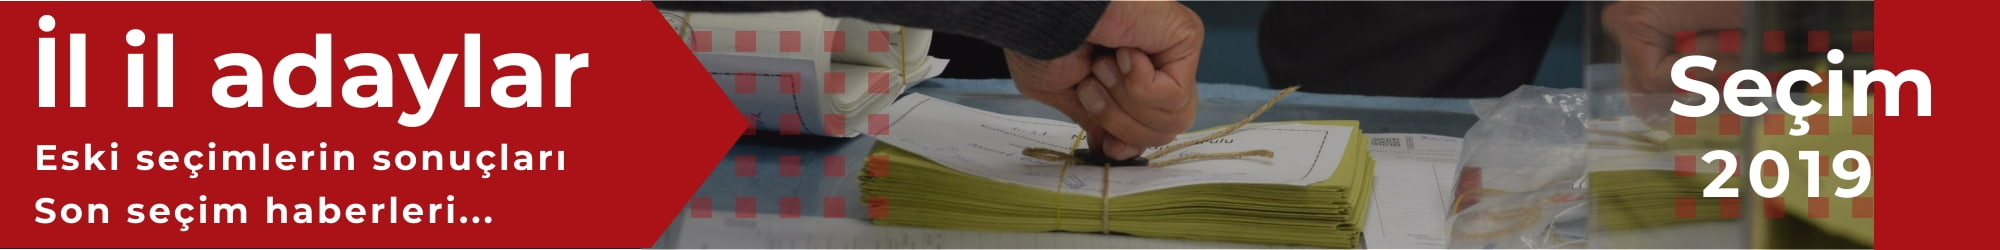 Yerel seçim 2019 - İl il aday listesi